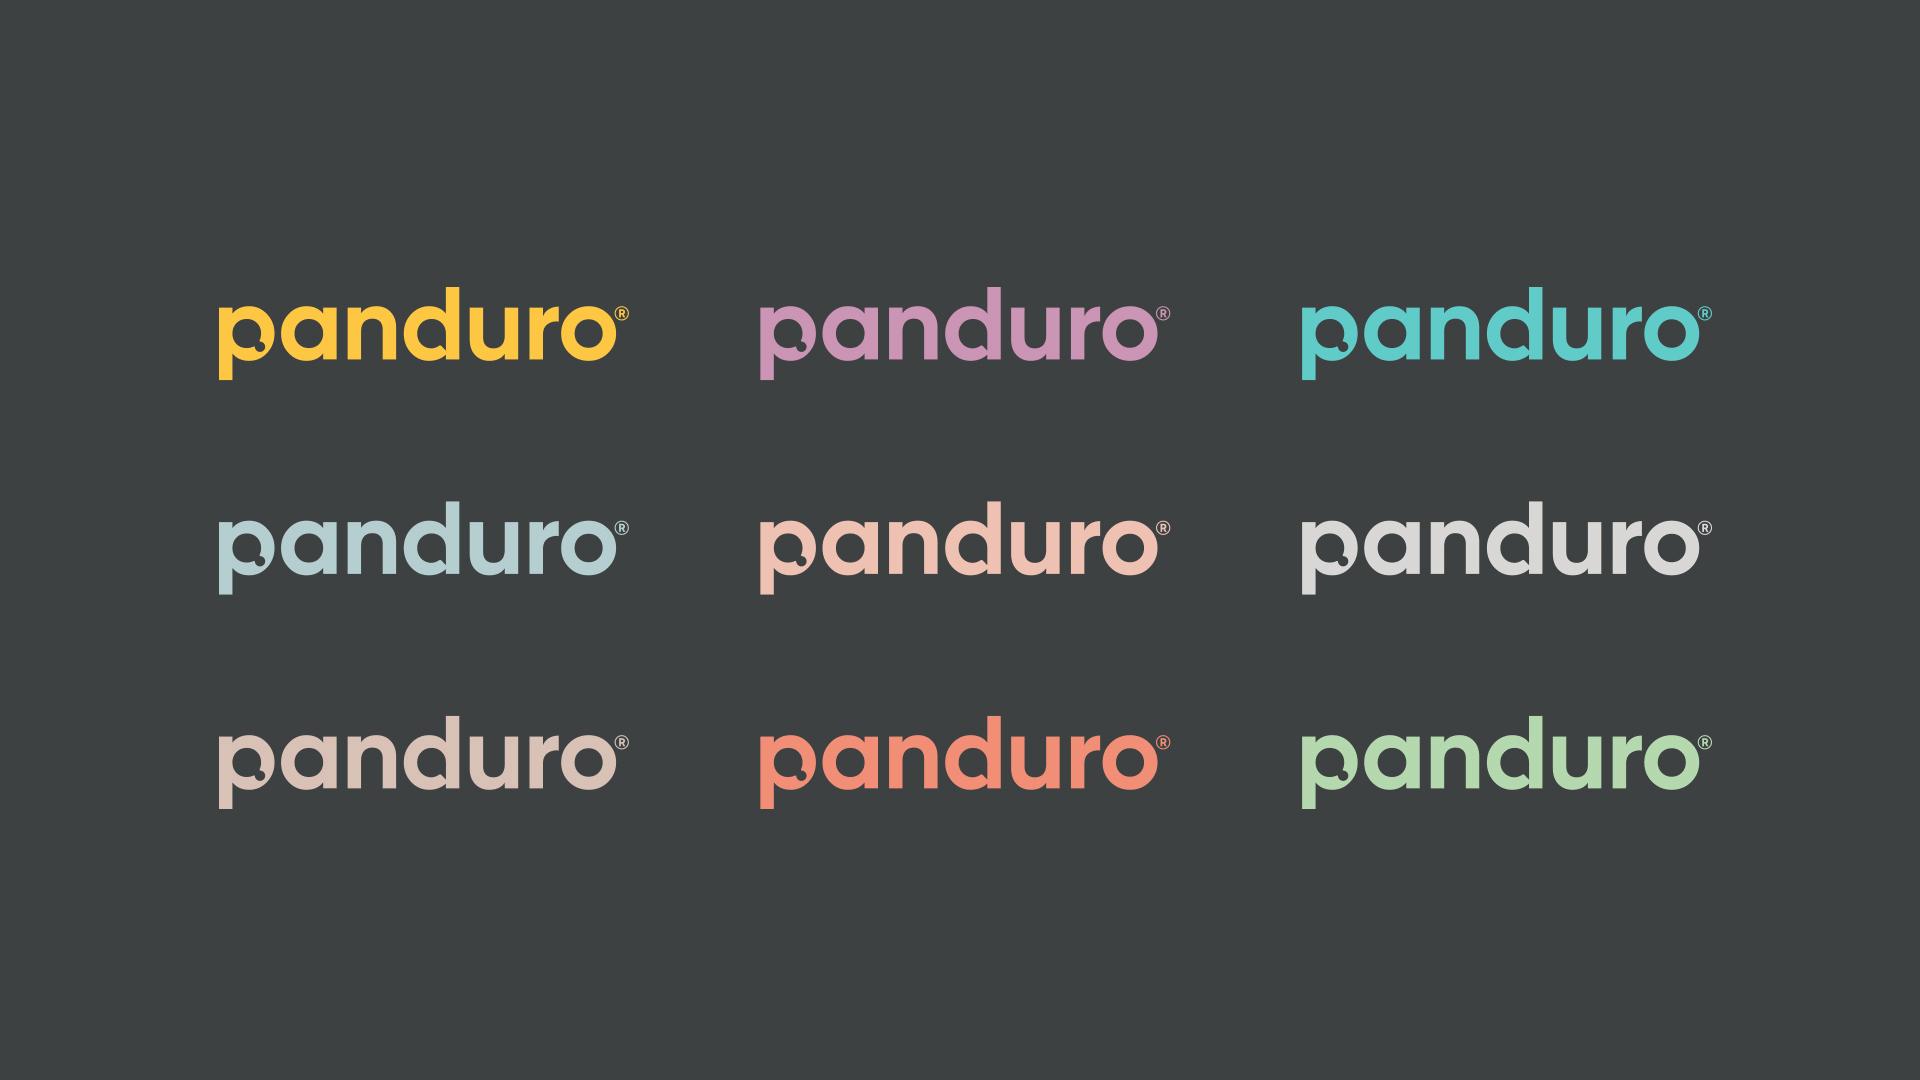 Panduro logotyp olika färger